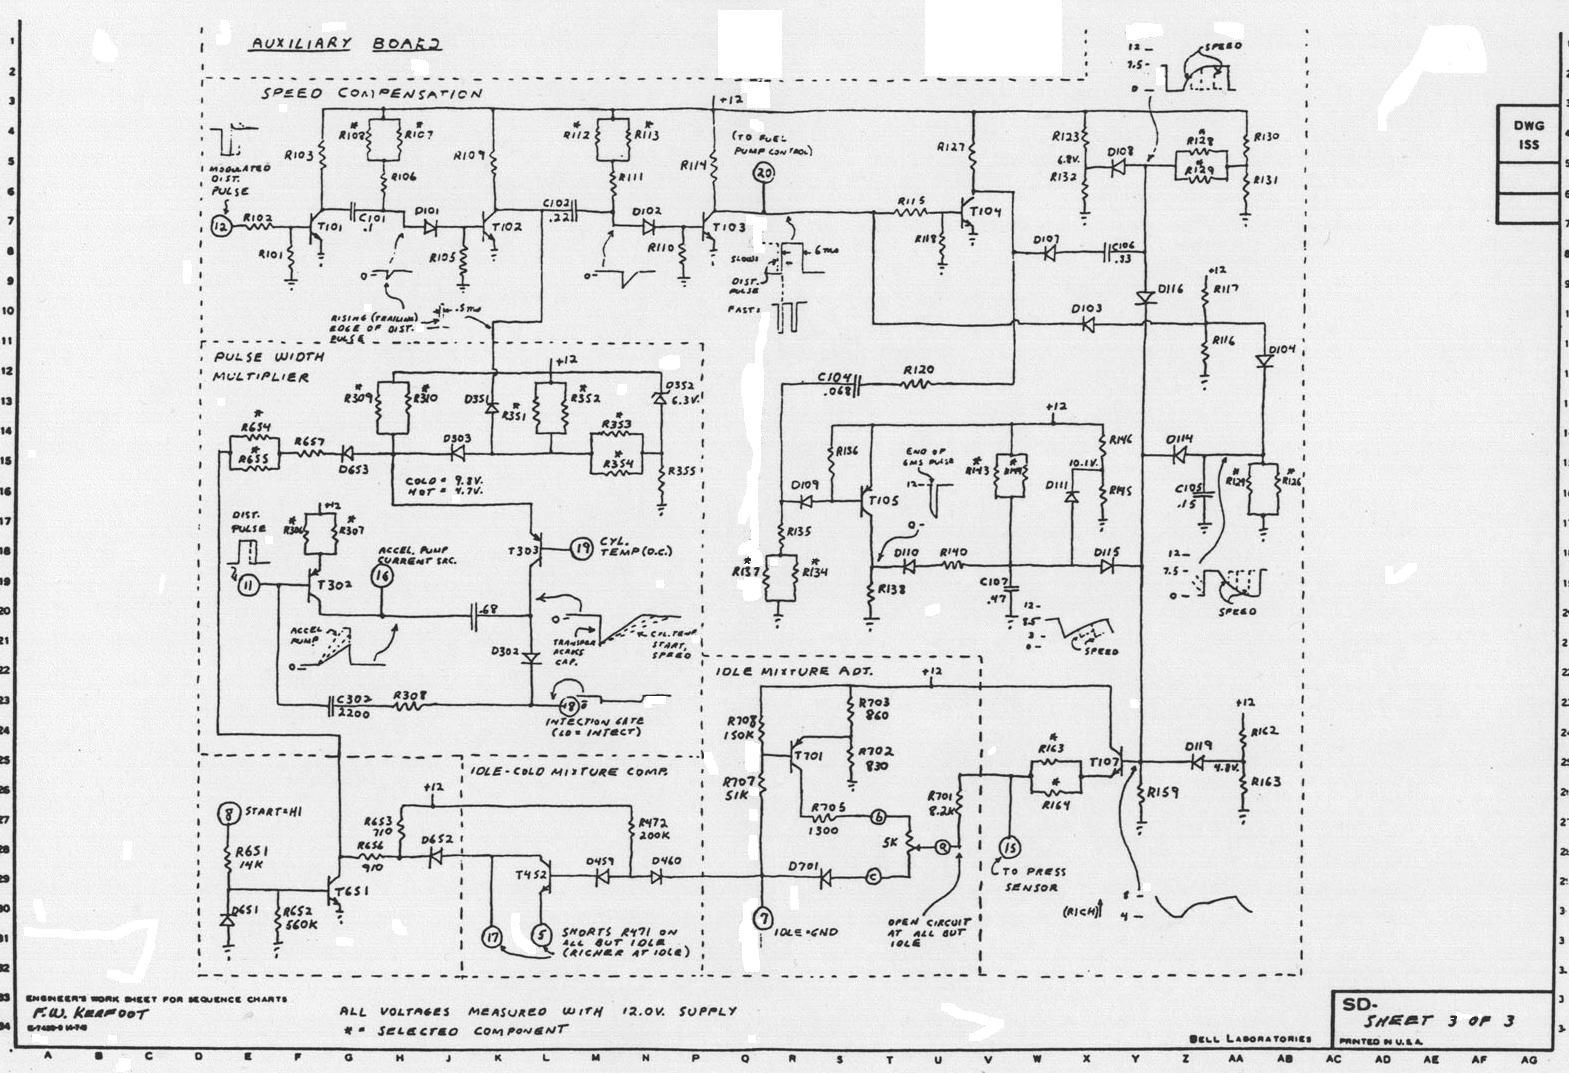 1972 porsche 914 wiring diagram venn comparing prokaryotic and eukaryotic cells engine diagrams imageresizertool com